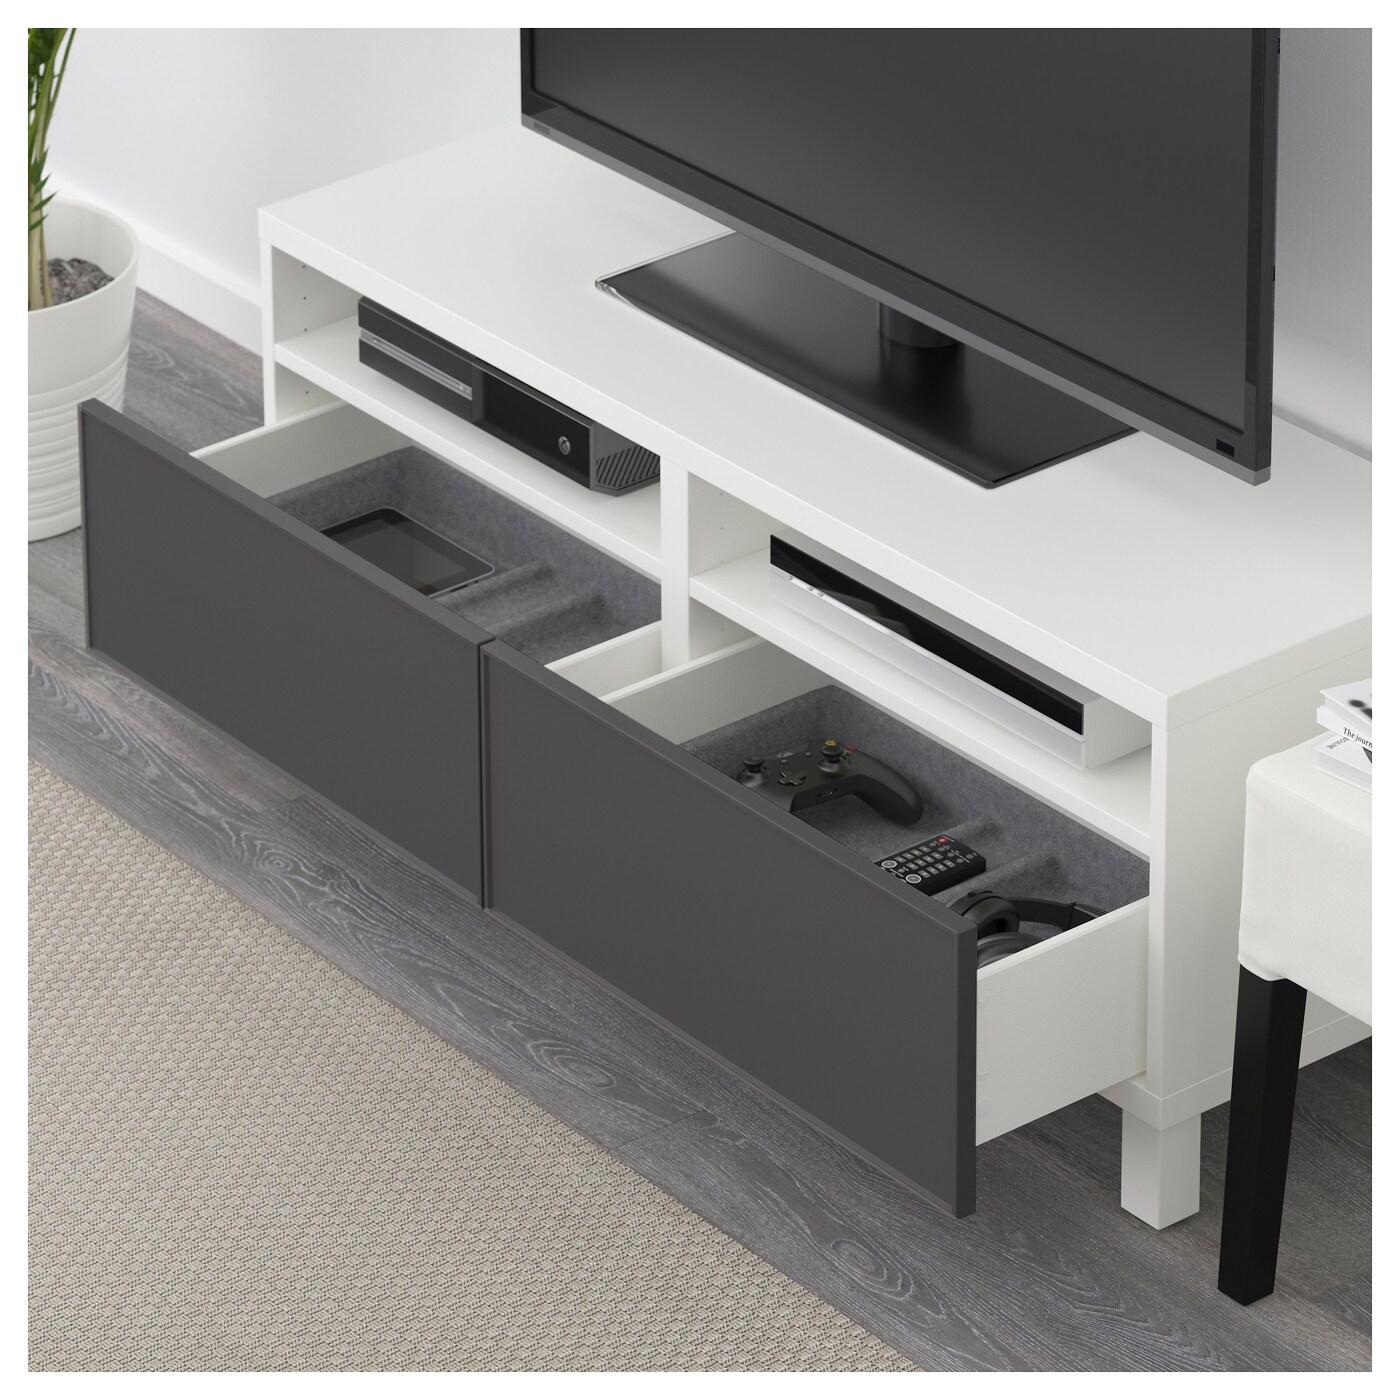 Best mueble tv con almacenaje blanco grundsviken gris oscuro 120 x 40 x 48 cm ikea - Muebles almacenaje ikea ...